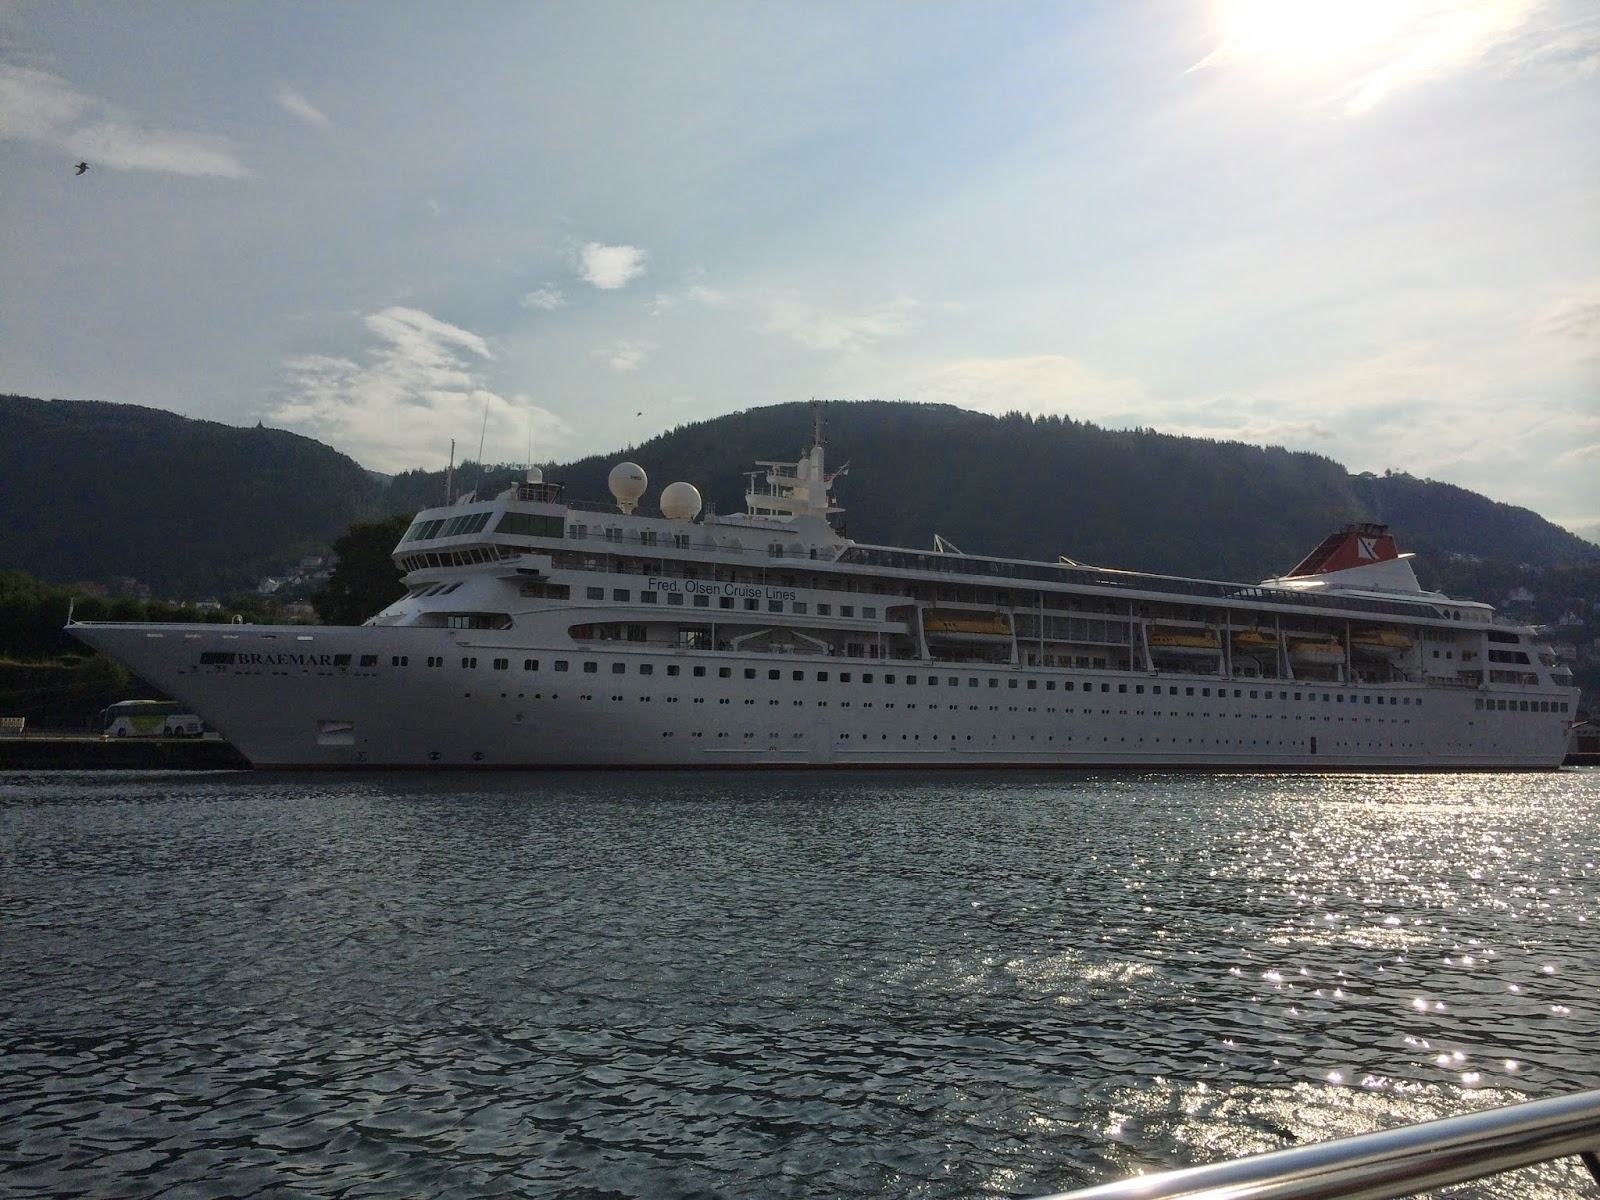 Cruise Ship Braemar in Bergen